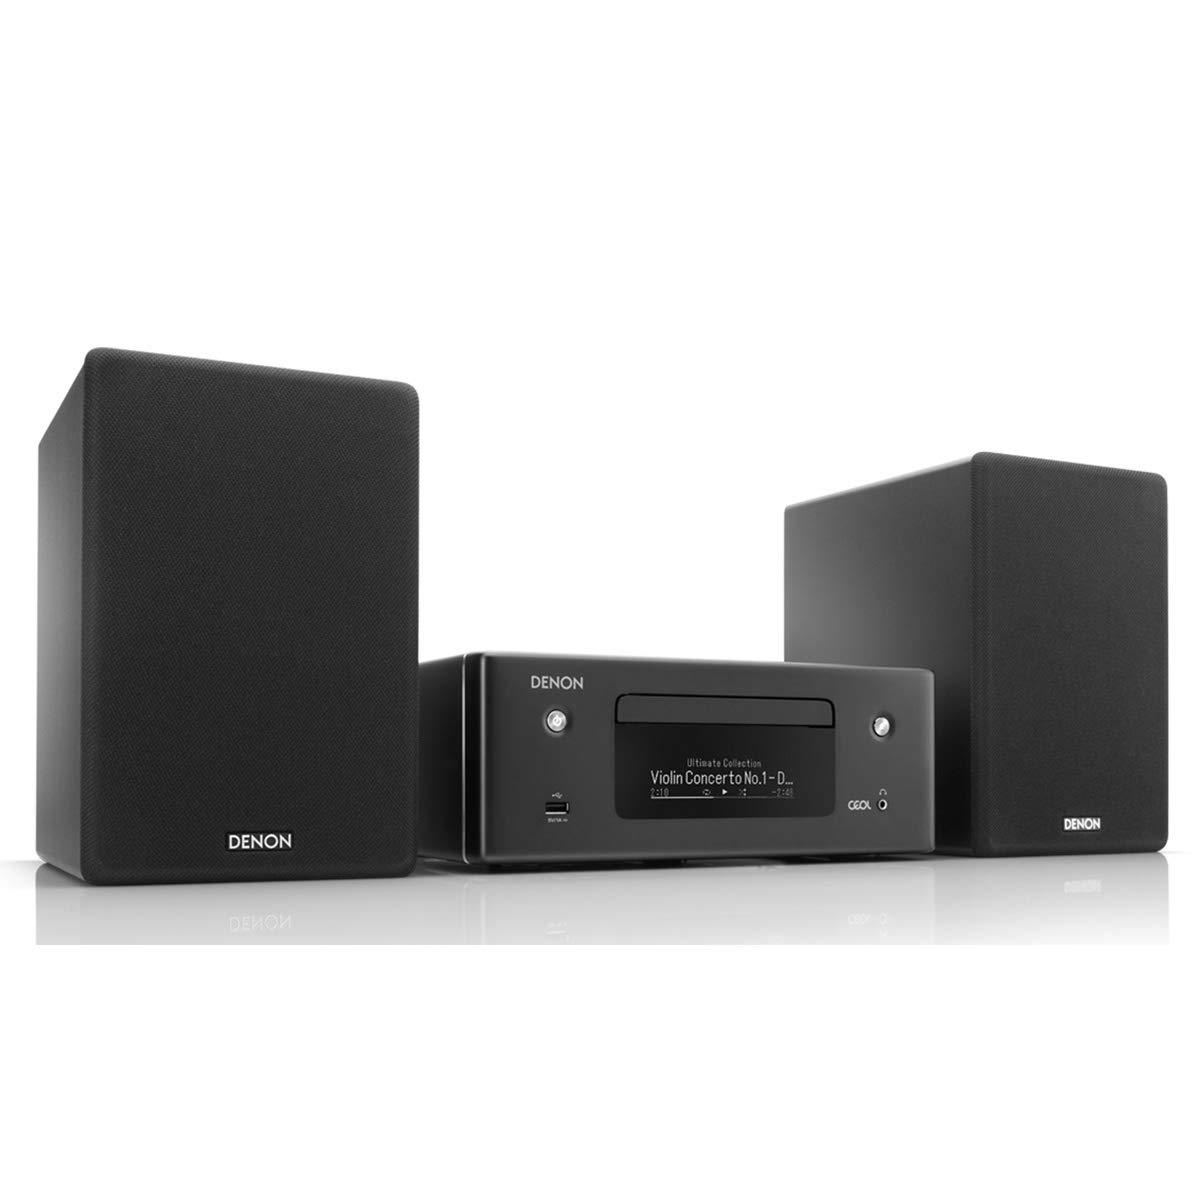 Denon CEOL-N10 Hi-Fi-Network CD Receiver with HEOS